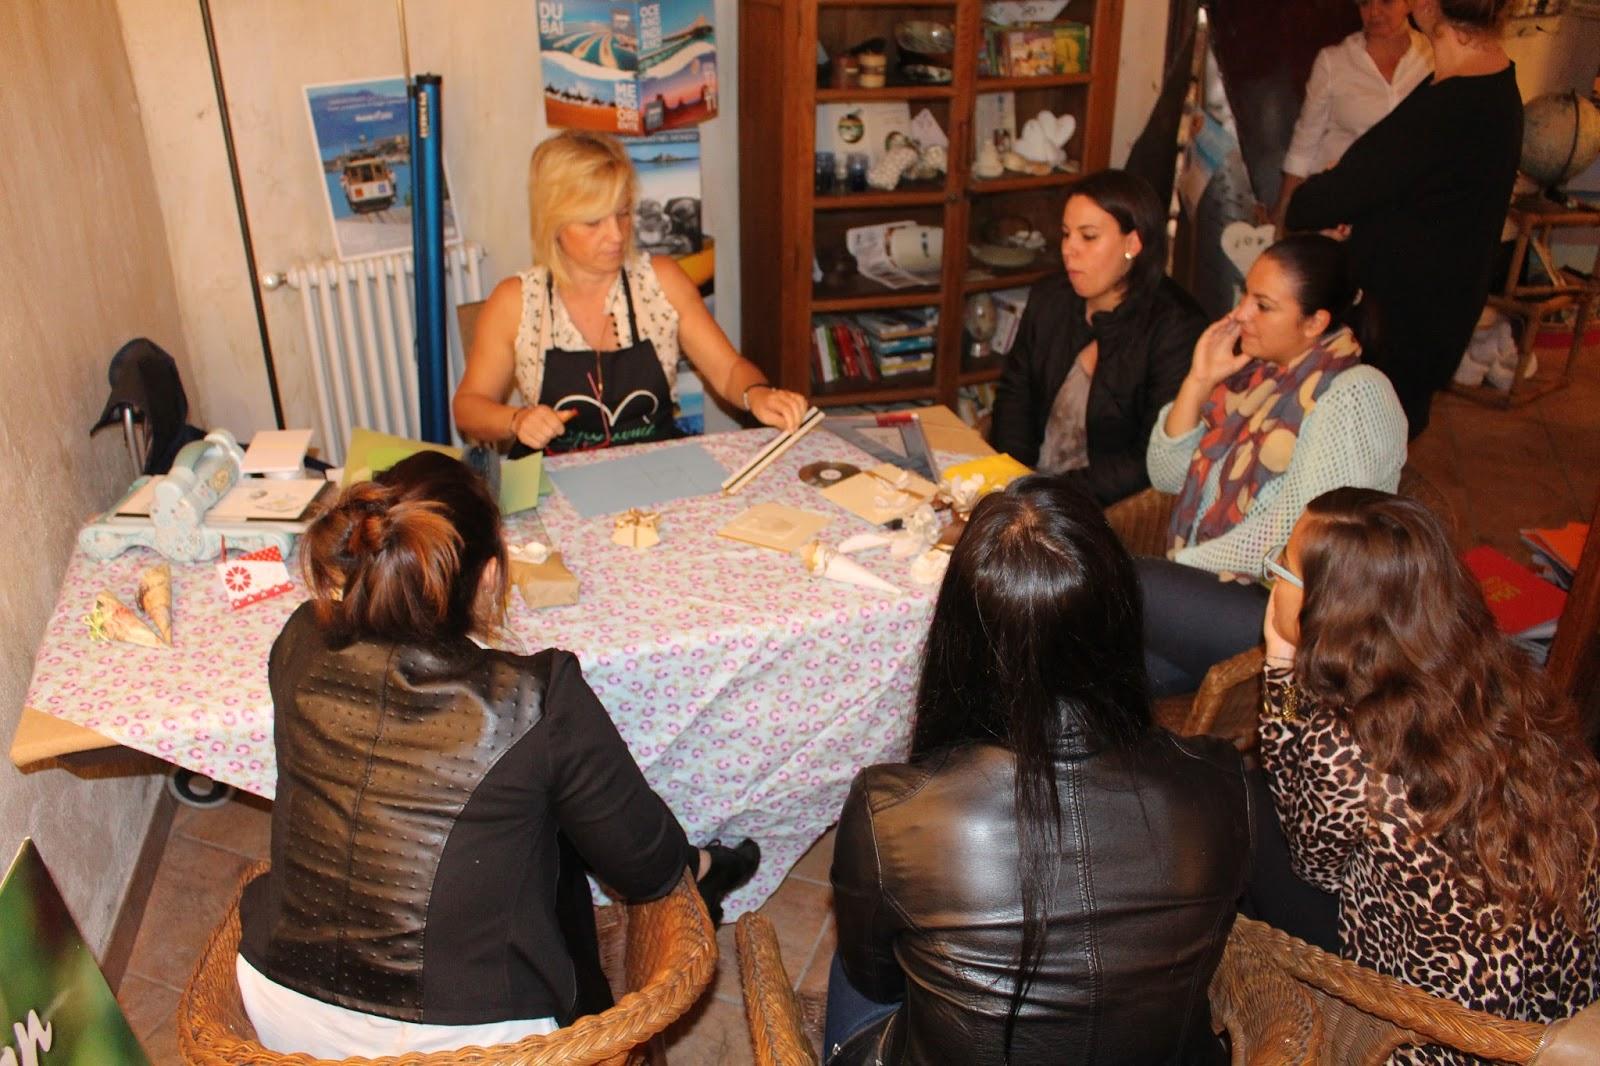 http://www.ilblogdisposamioggi.com/2014/10/matrimoniofaidate.html